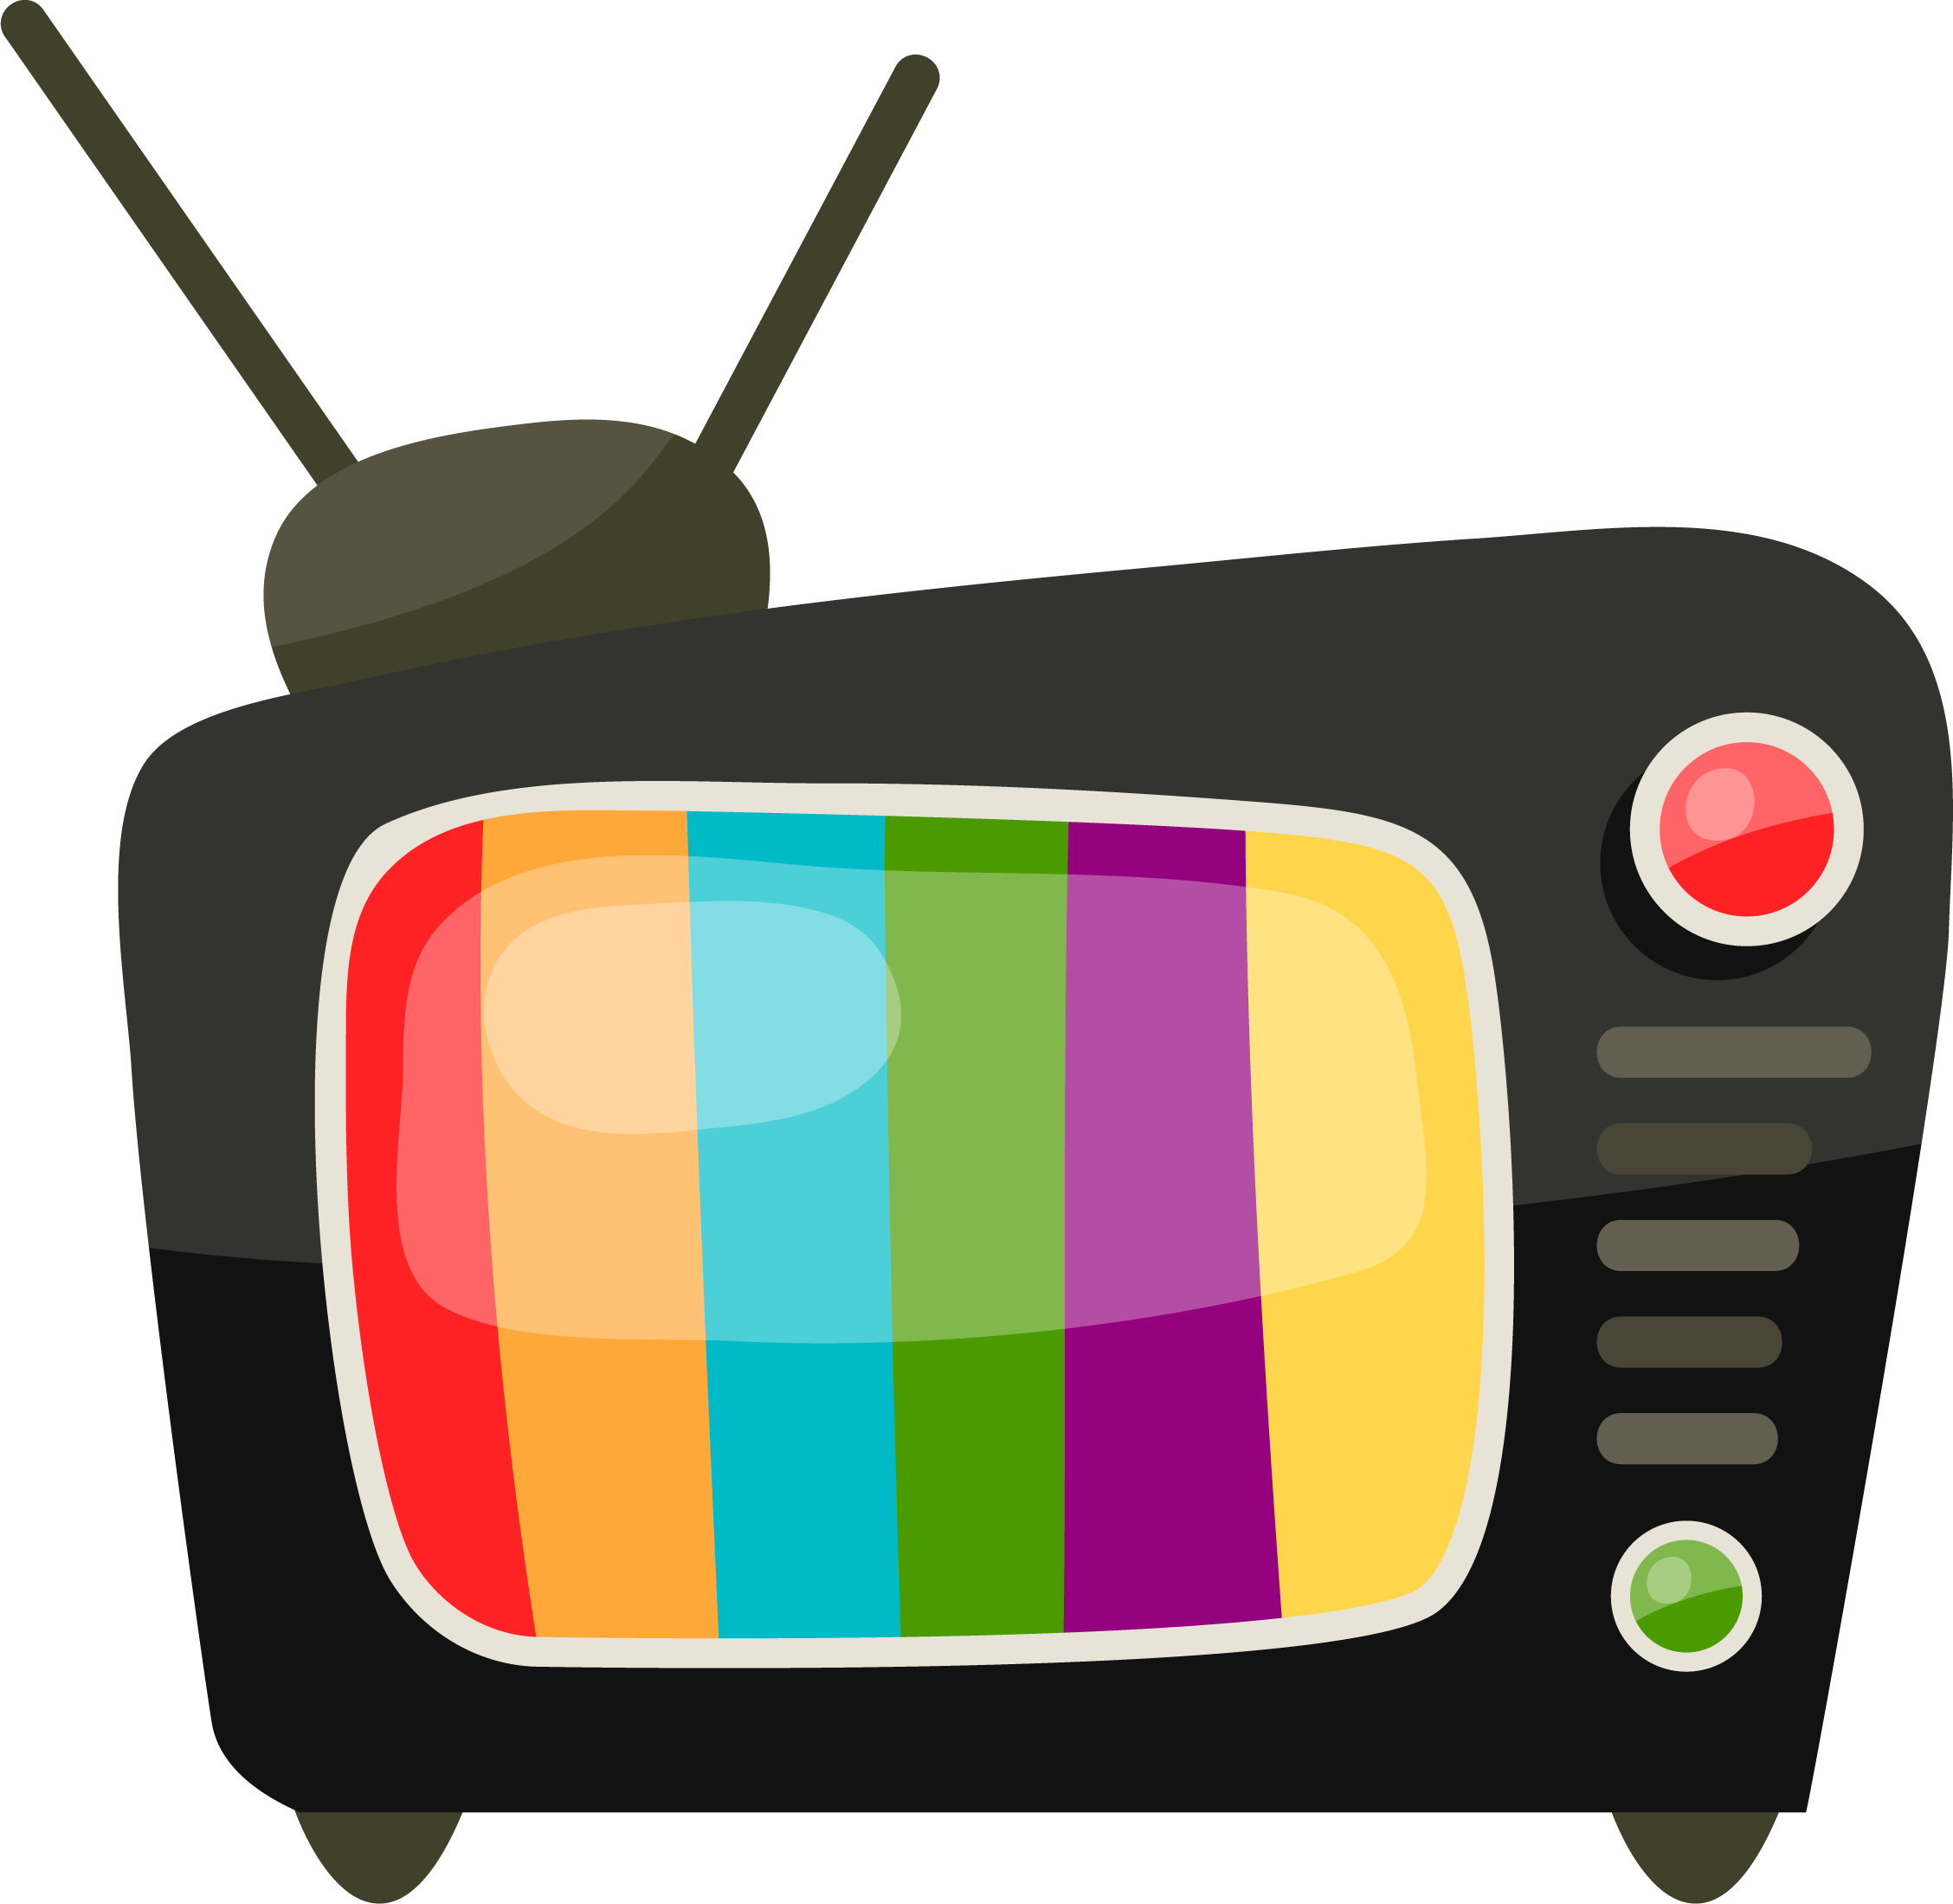 Television clipart tele. Png transparent free images